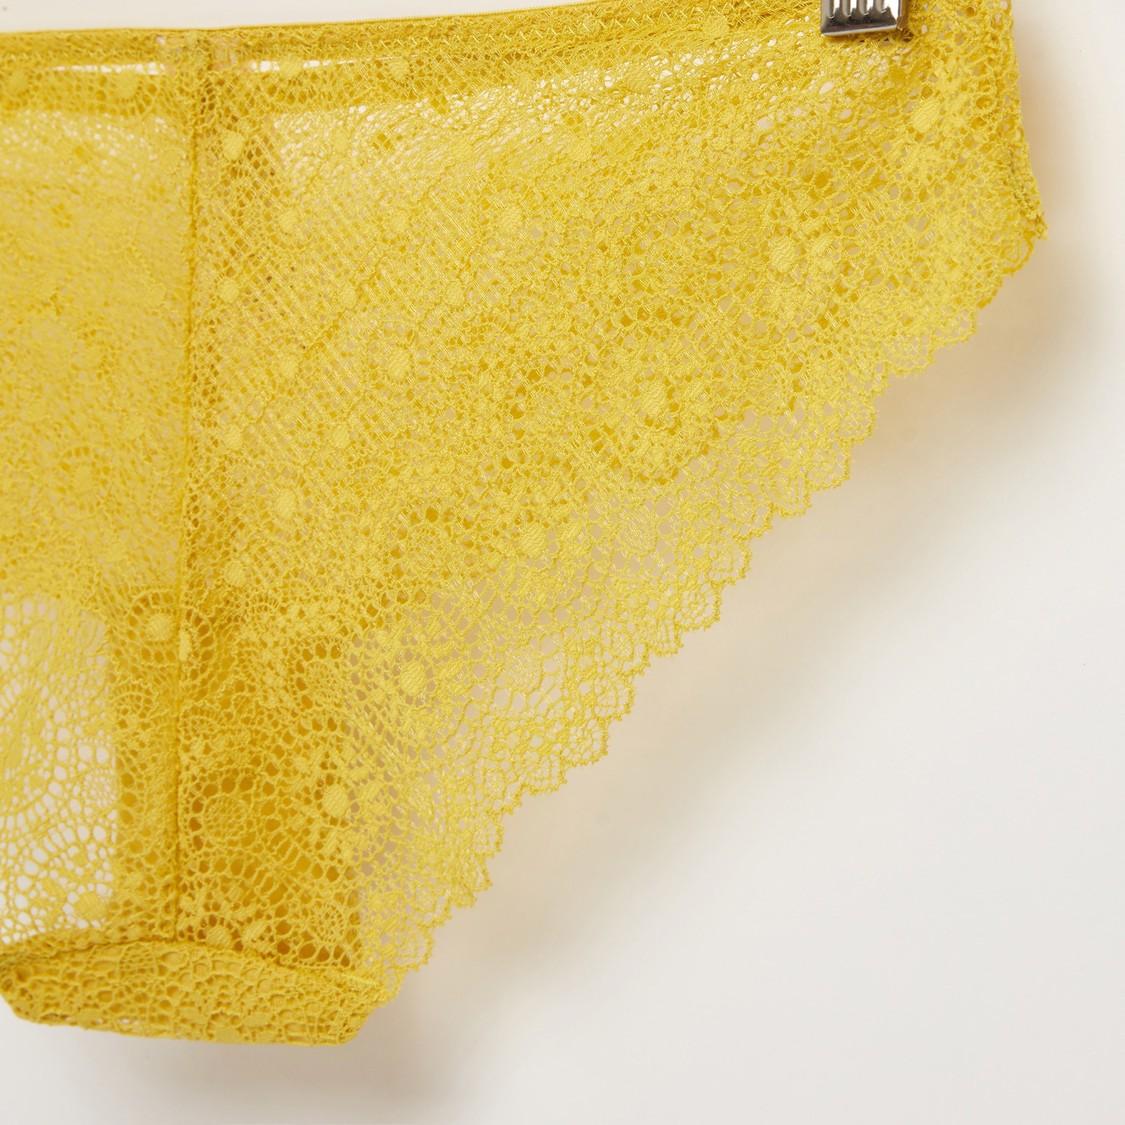 سروال داخلي برازيليان دانتيل بخصر مطاطي